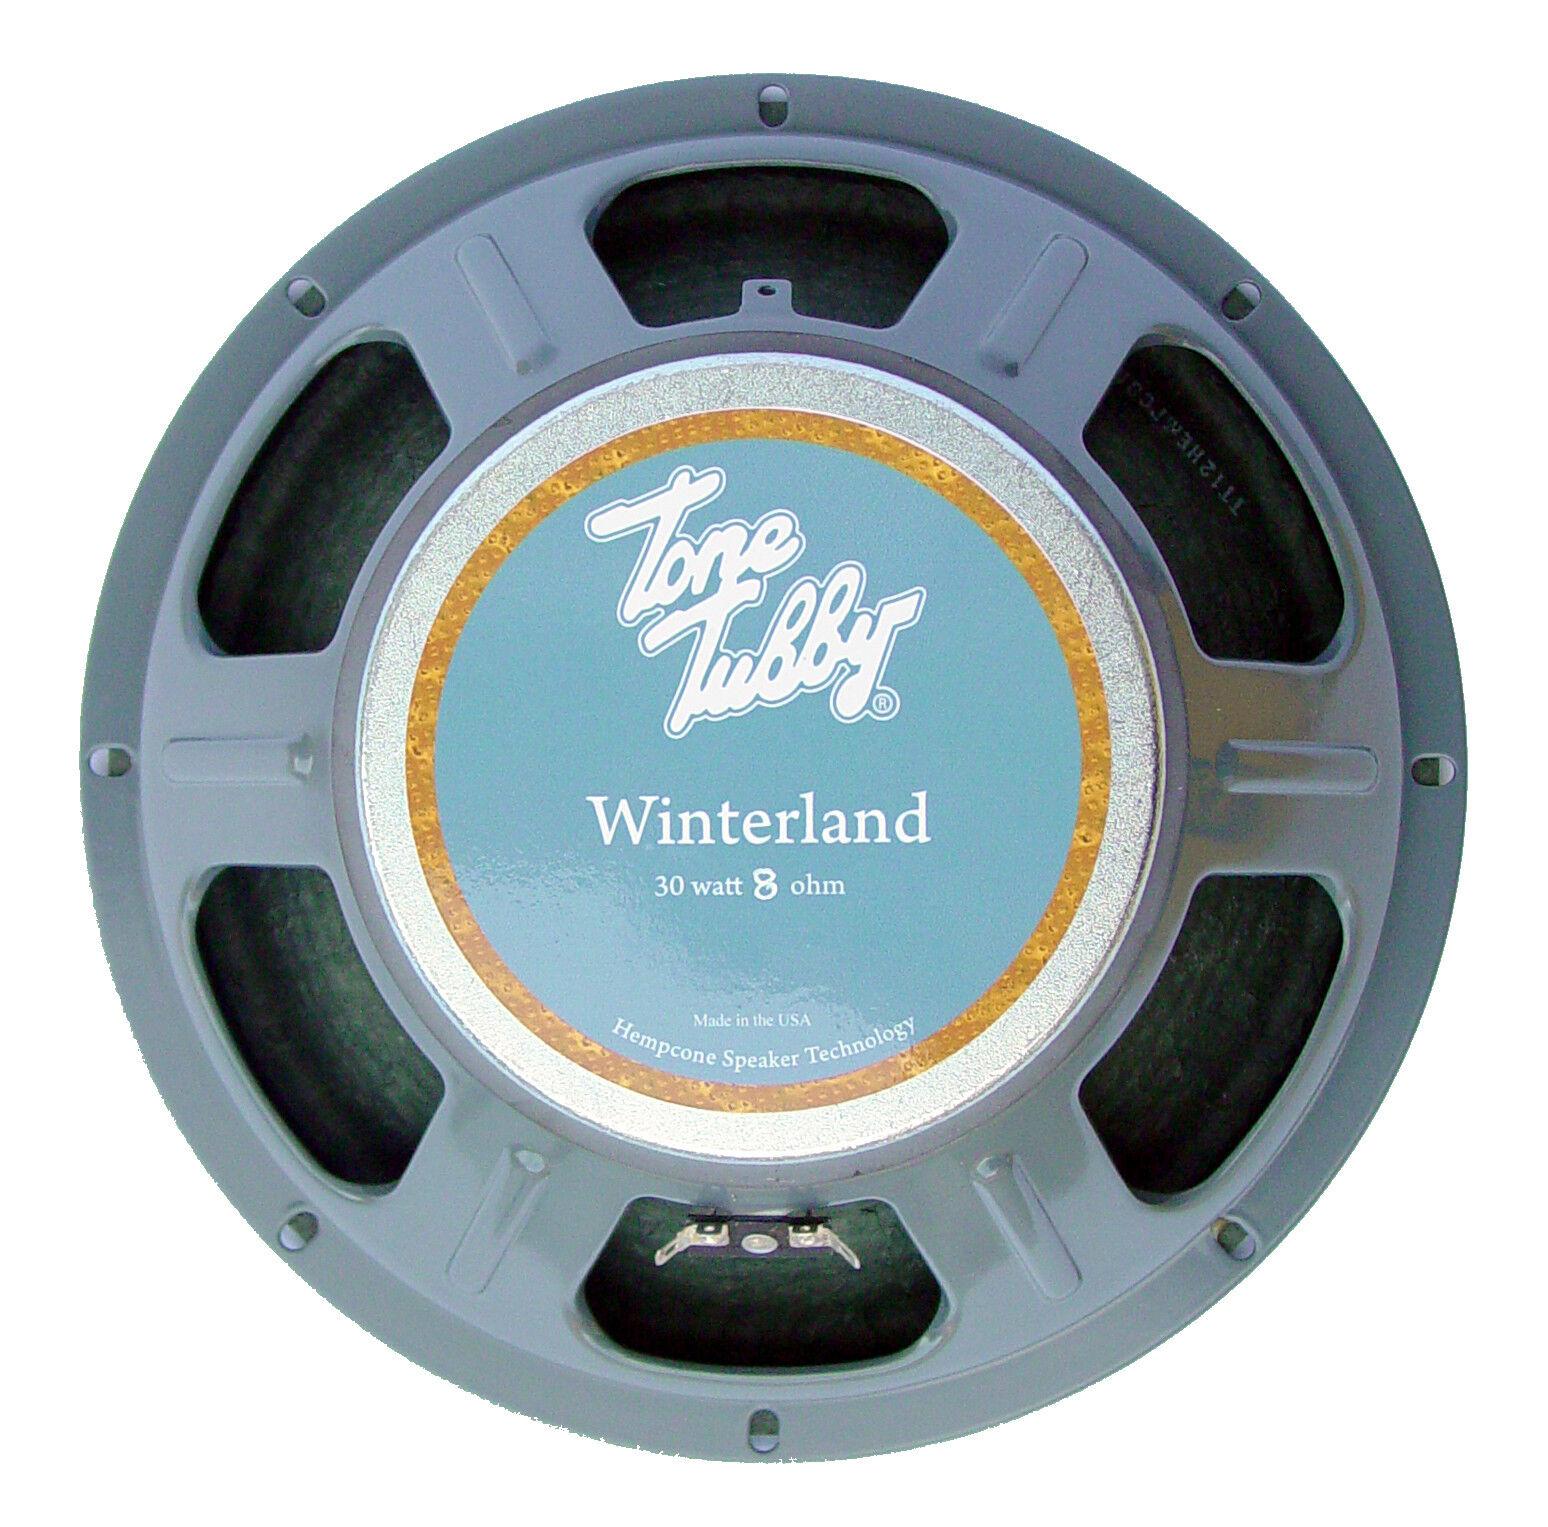 Tone Tubby 12  Winterland Ceramic Hemp Cone Guitar Speaker 8 ohm NEW + Warranty